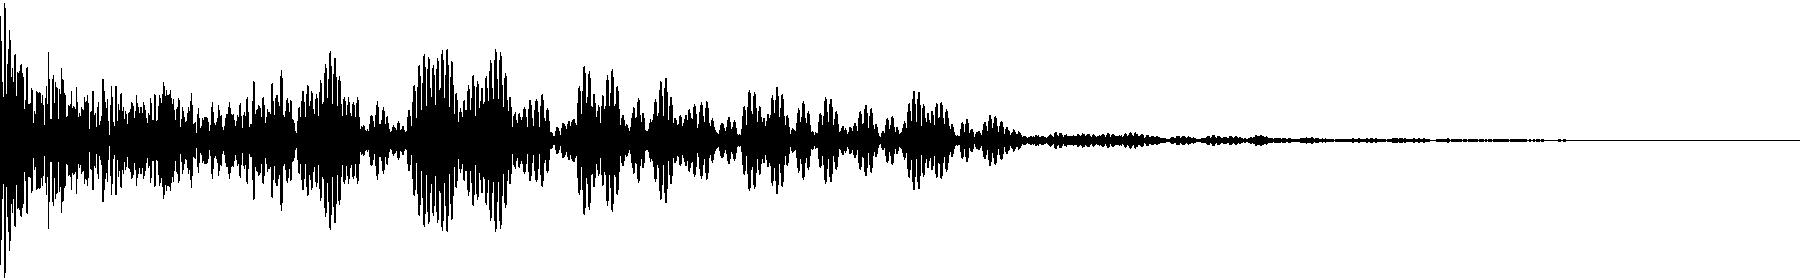 vedh synth cut 030 gm9